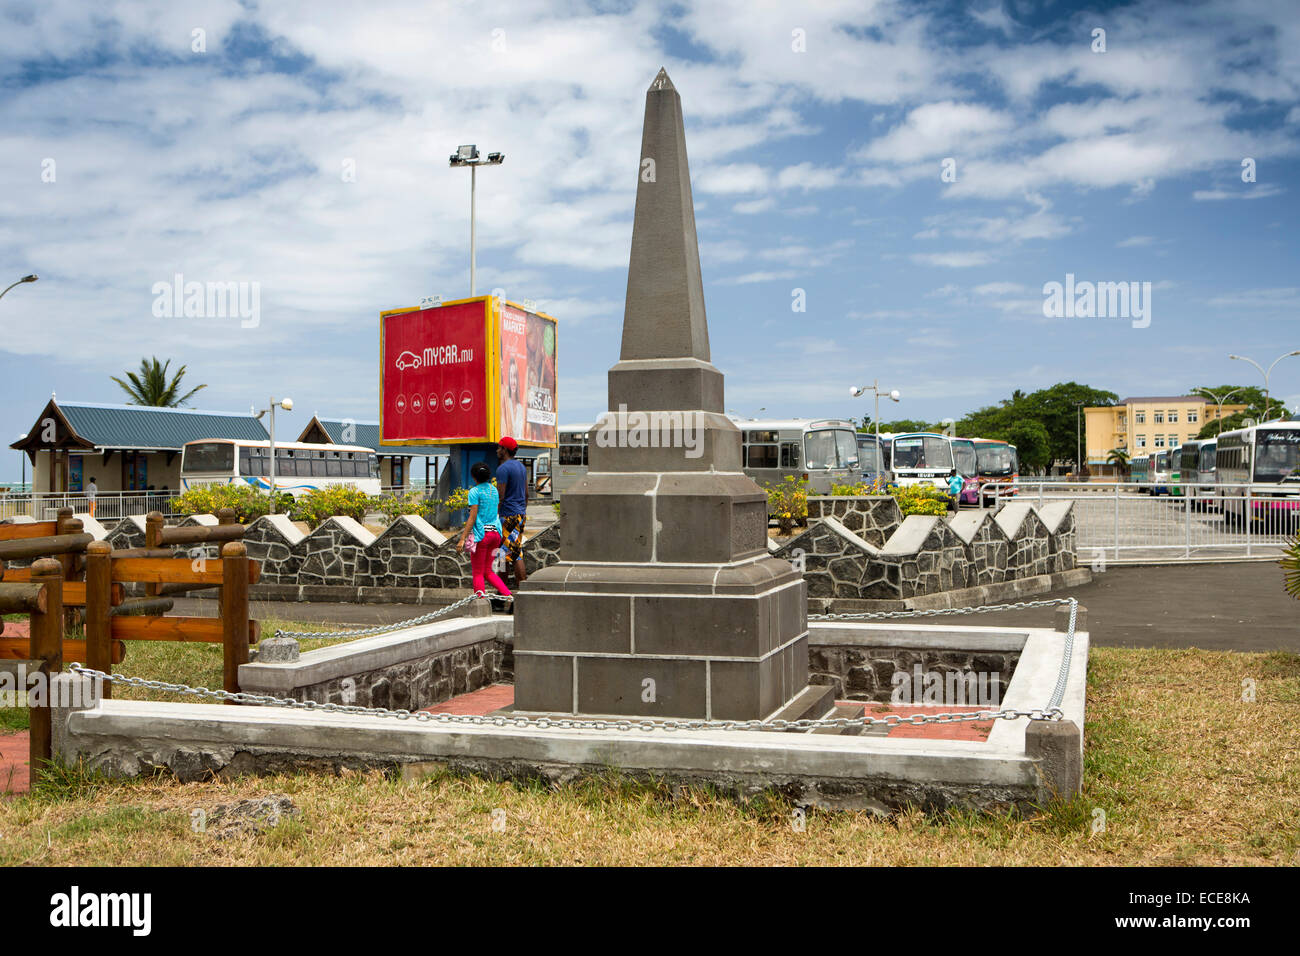 Mauritius, Mahebourg, seafront, memorial obelisk in public park - Stock Image